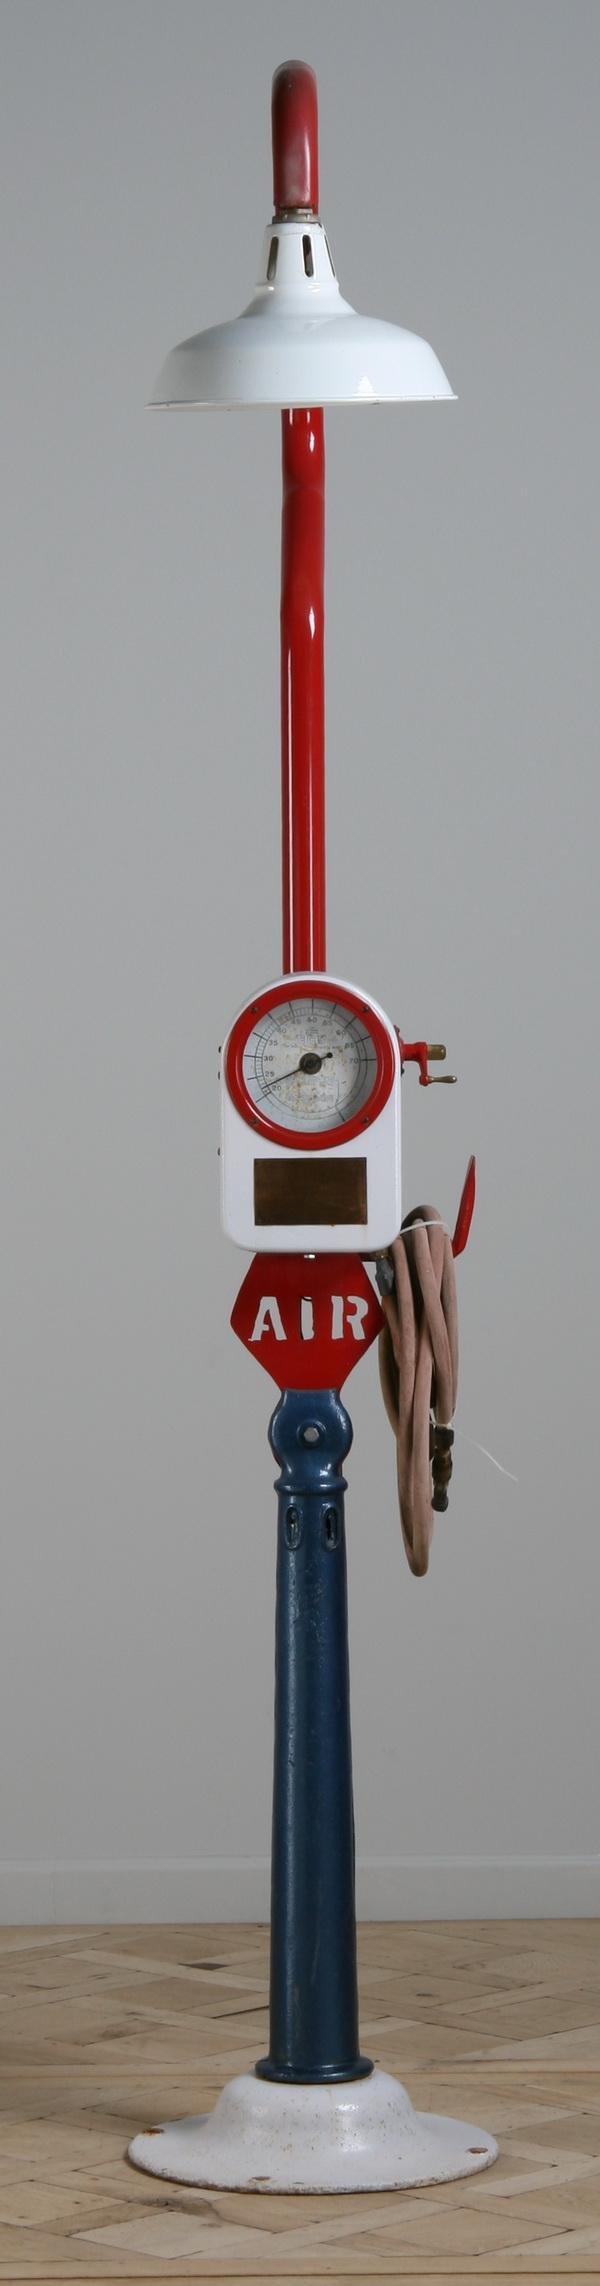 6: Vintage air compressor